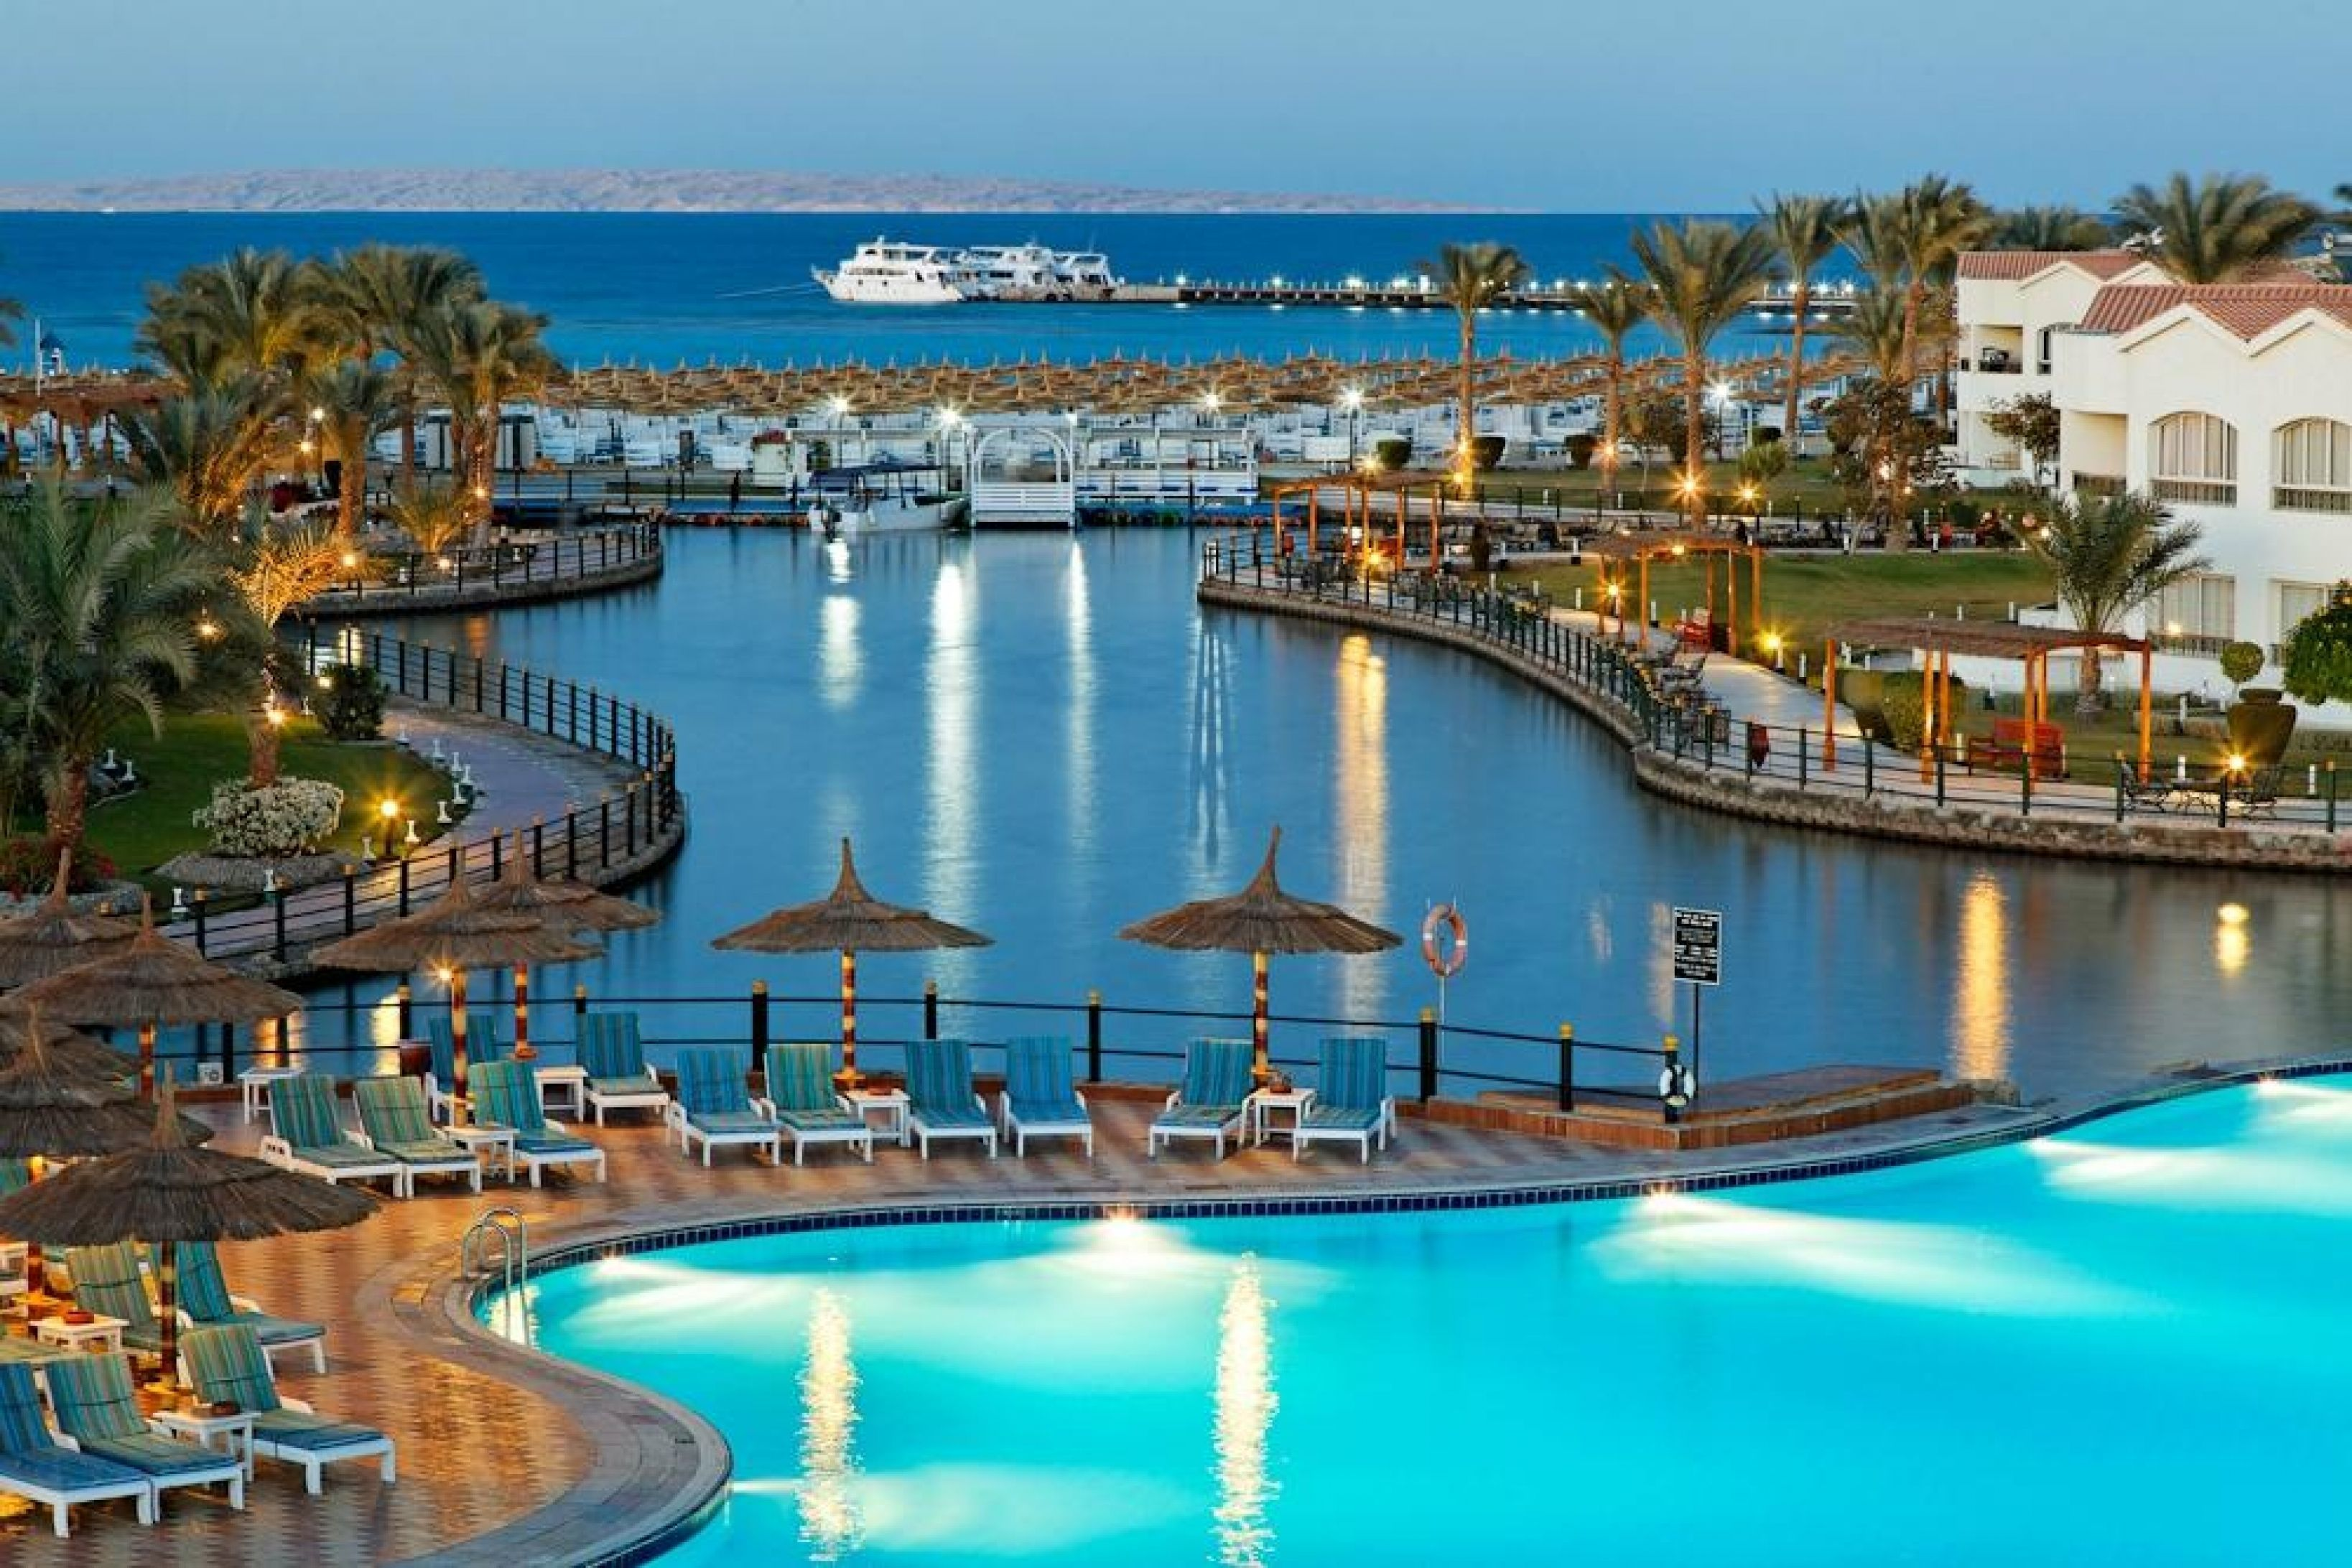 Captivating Dana Beach Resort Hurghada Egypt Resort Reviews Tripadvisor As Well As Hurghada In Egypt Resorts Hurghada Hurghada Egypt